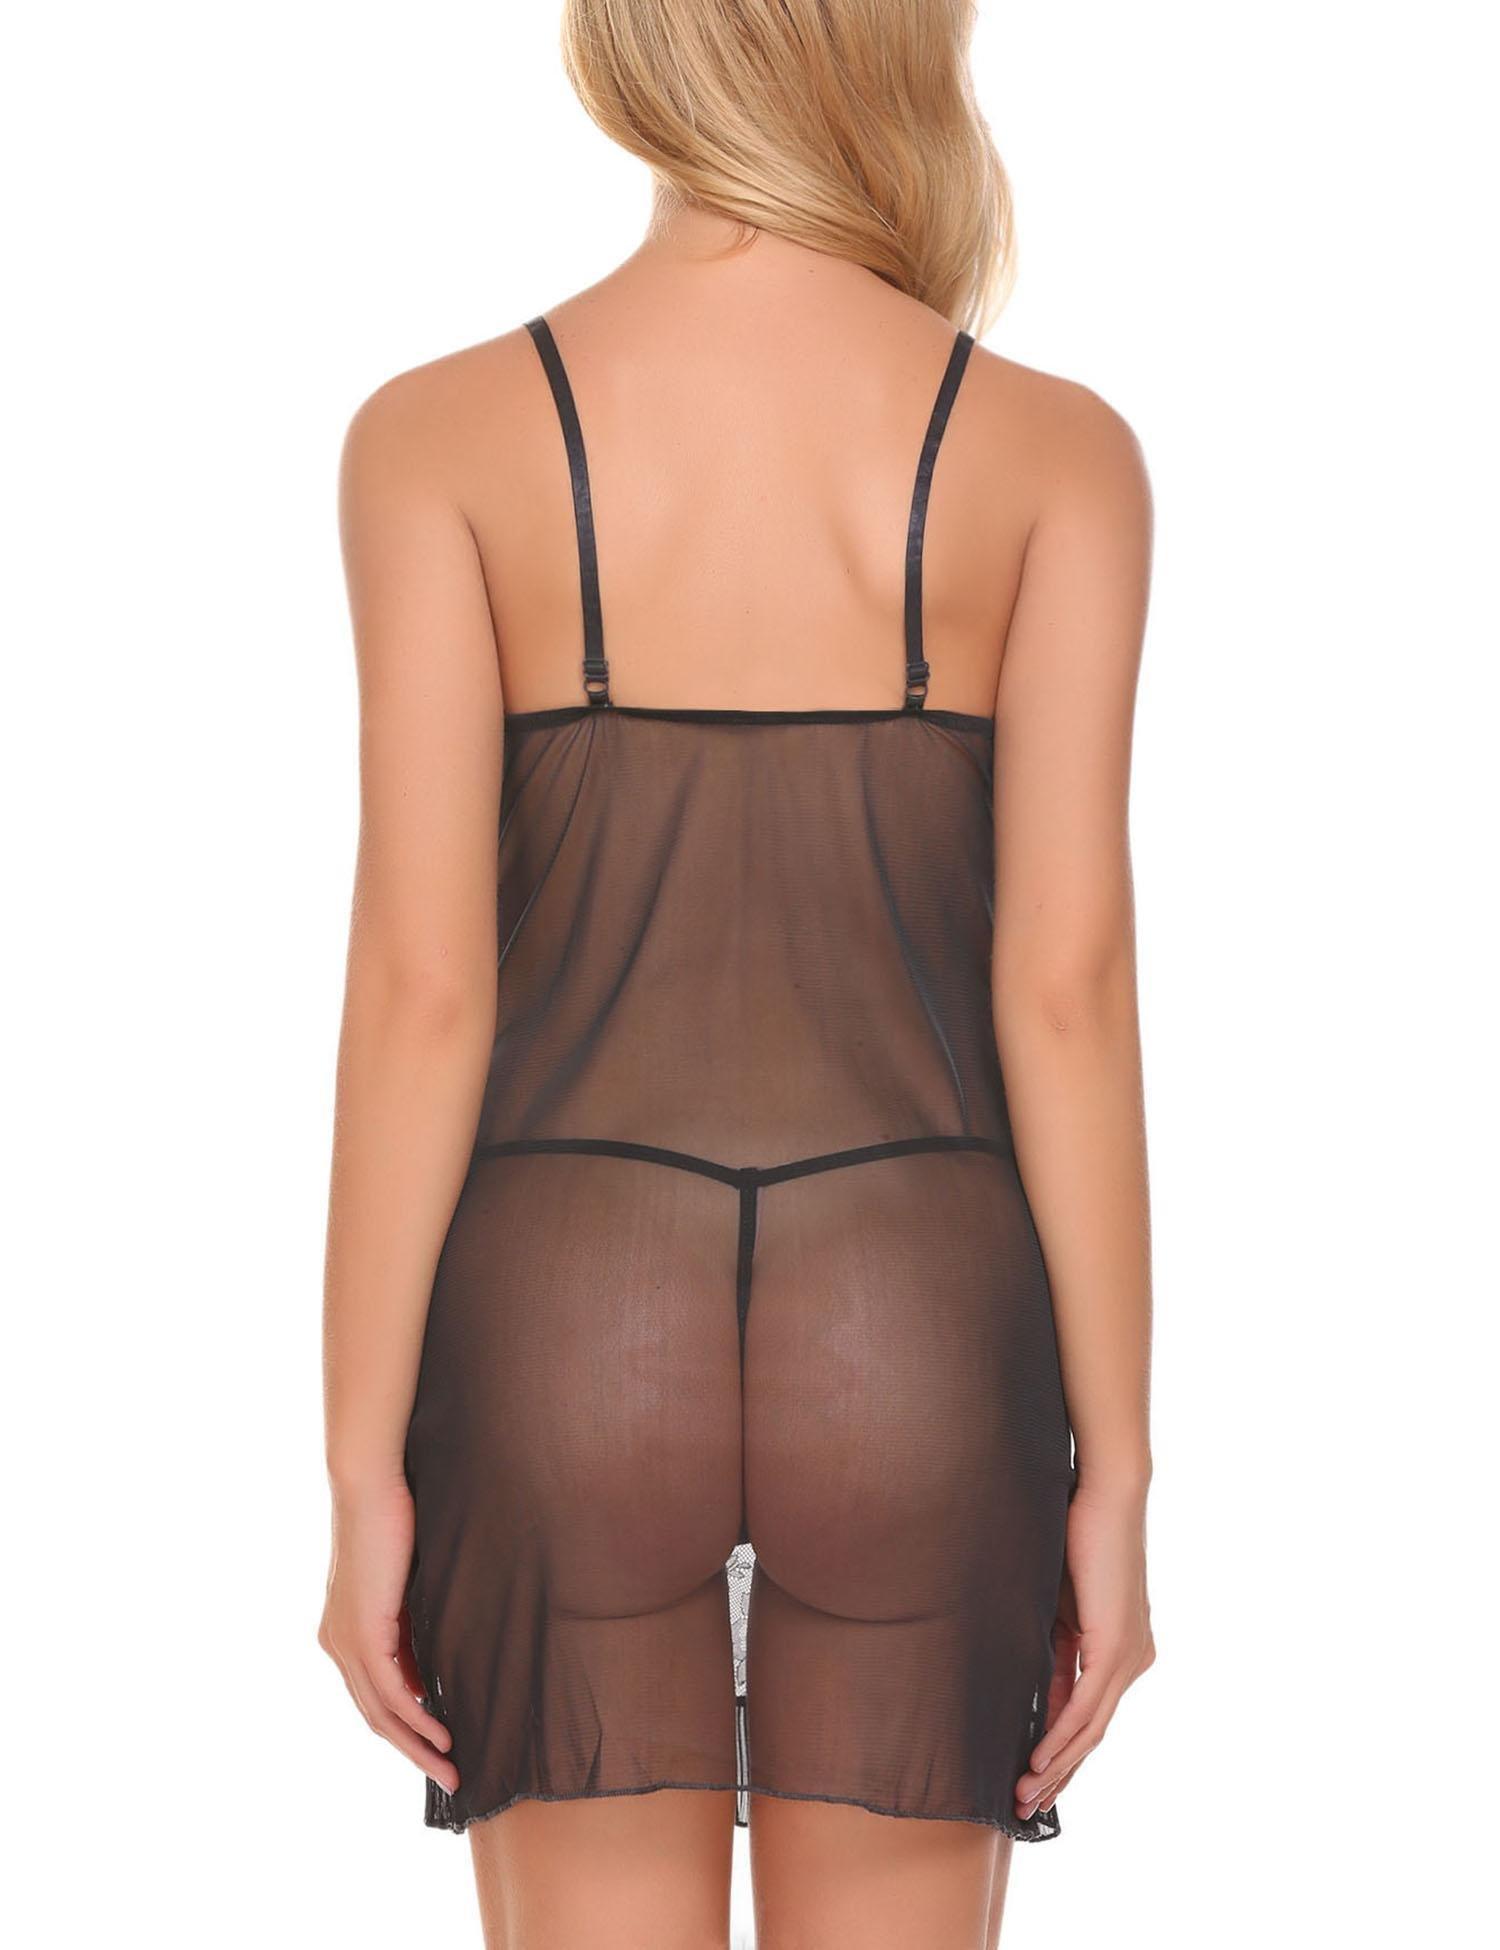 Pintmi Women V-Neck Lace Babydoll Mesh Chemise Sexy Lingerie Black L